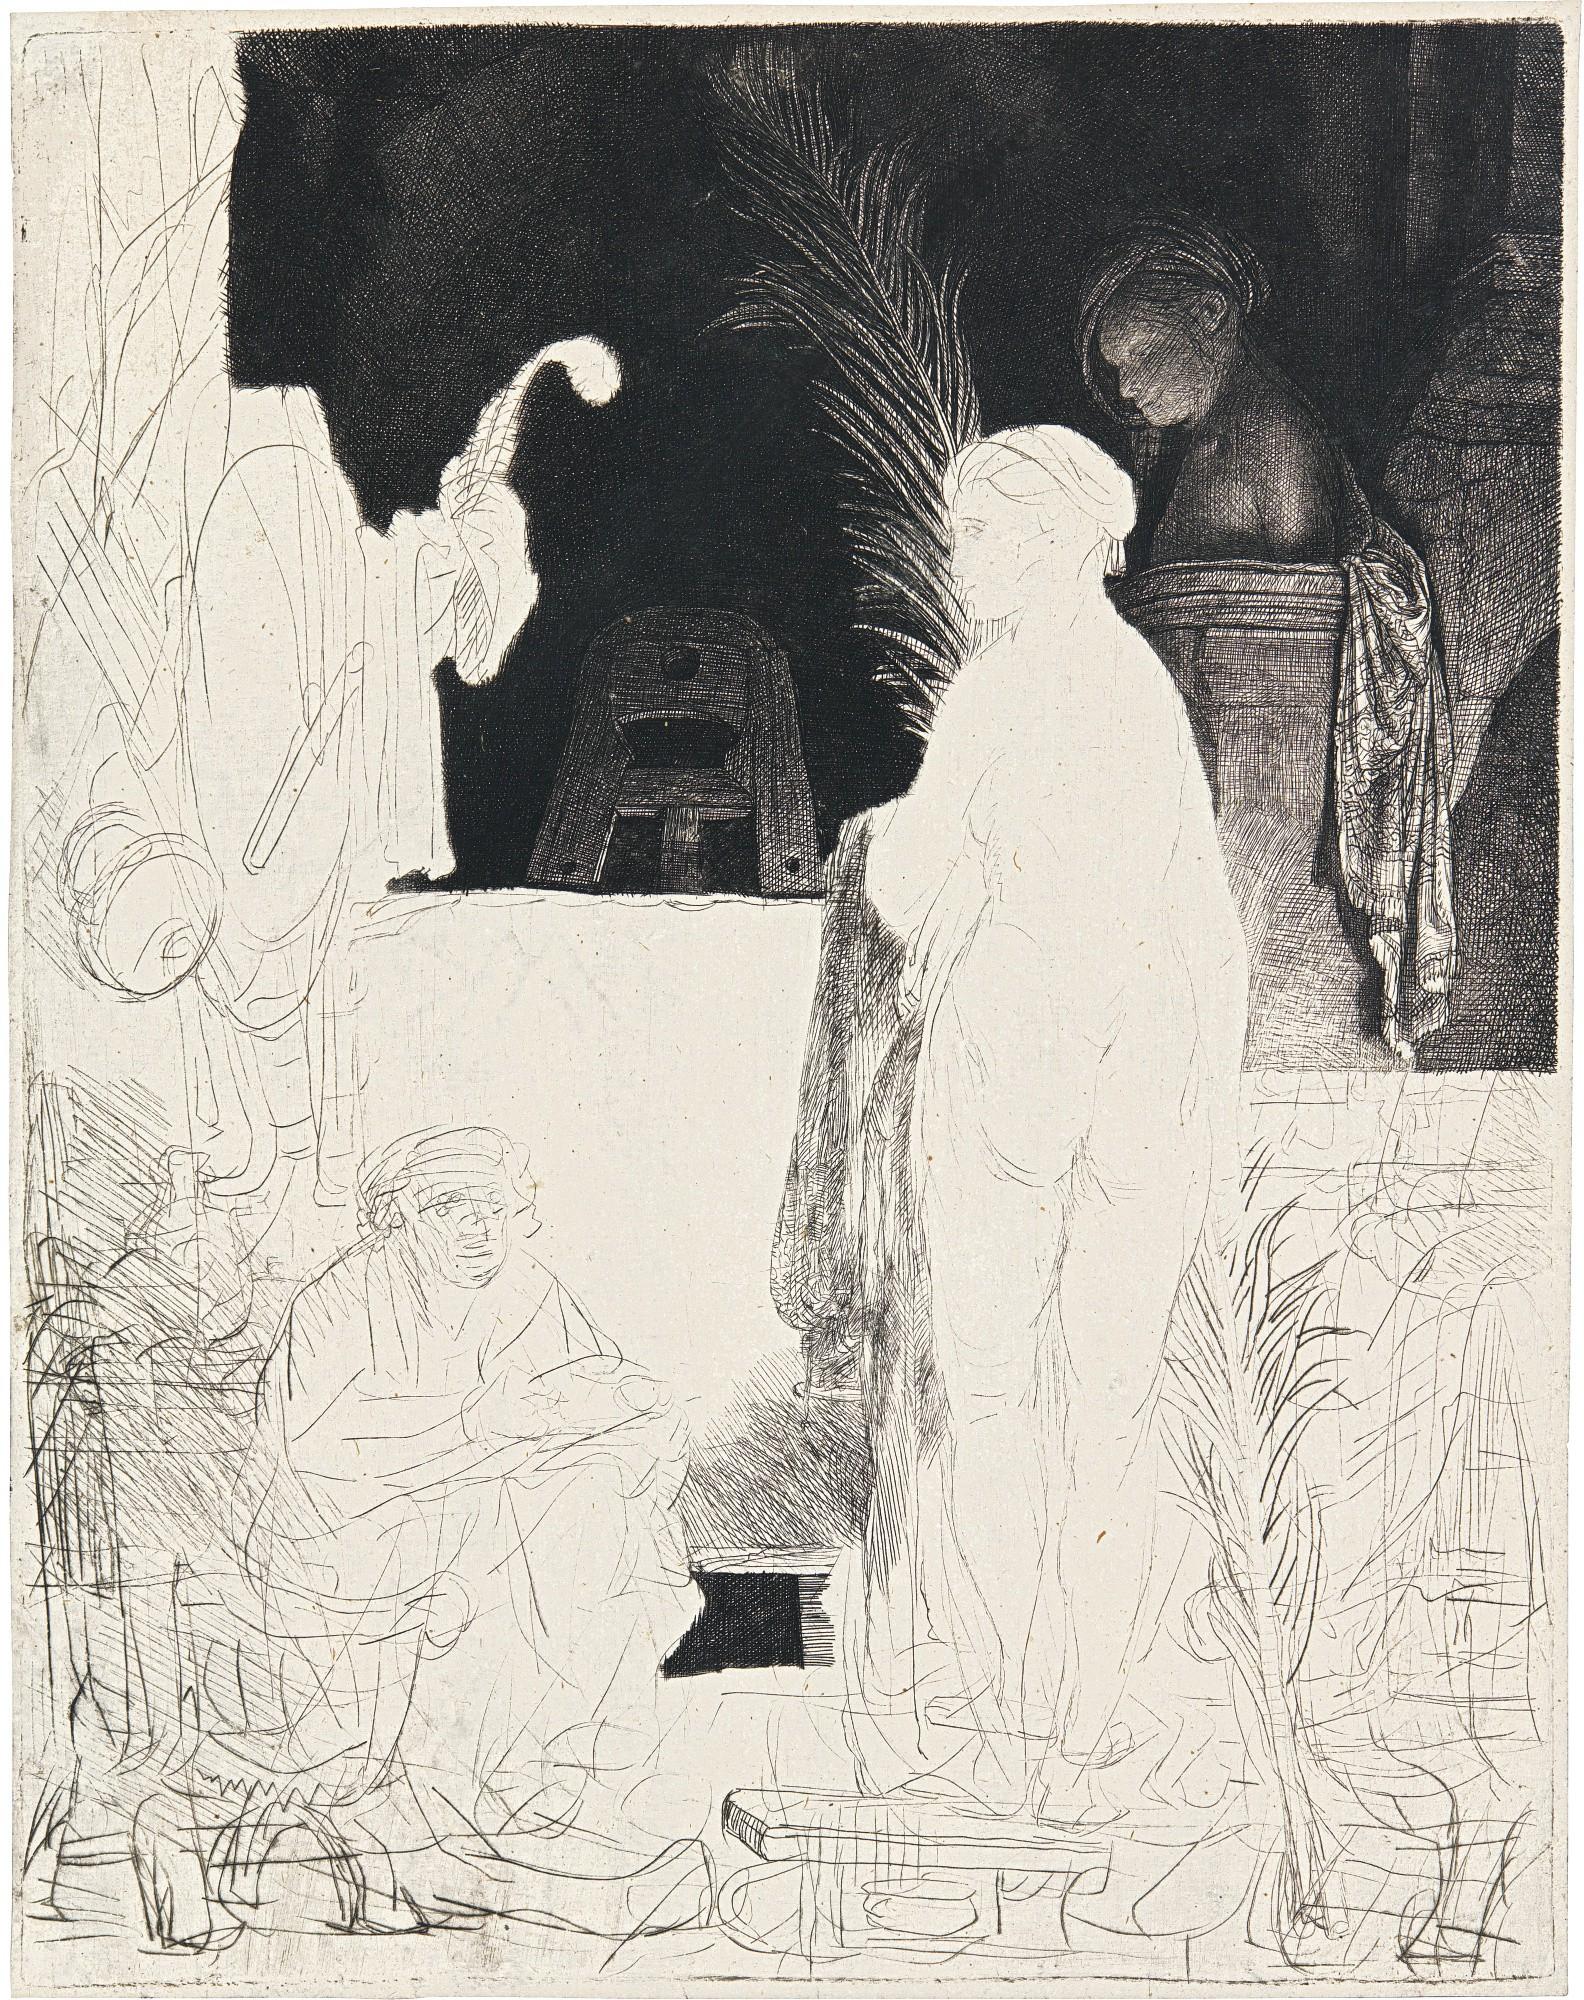 REMBRANDT HARMENSZ. VAN RIJN | THE ARTIST DRAWING FROM THE MODEL ('HET BEELDT VAN PIGMALION') (B., HOLL. 192; NEW HOLL. 176; H. 231)